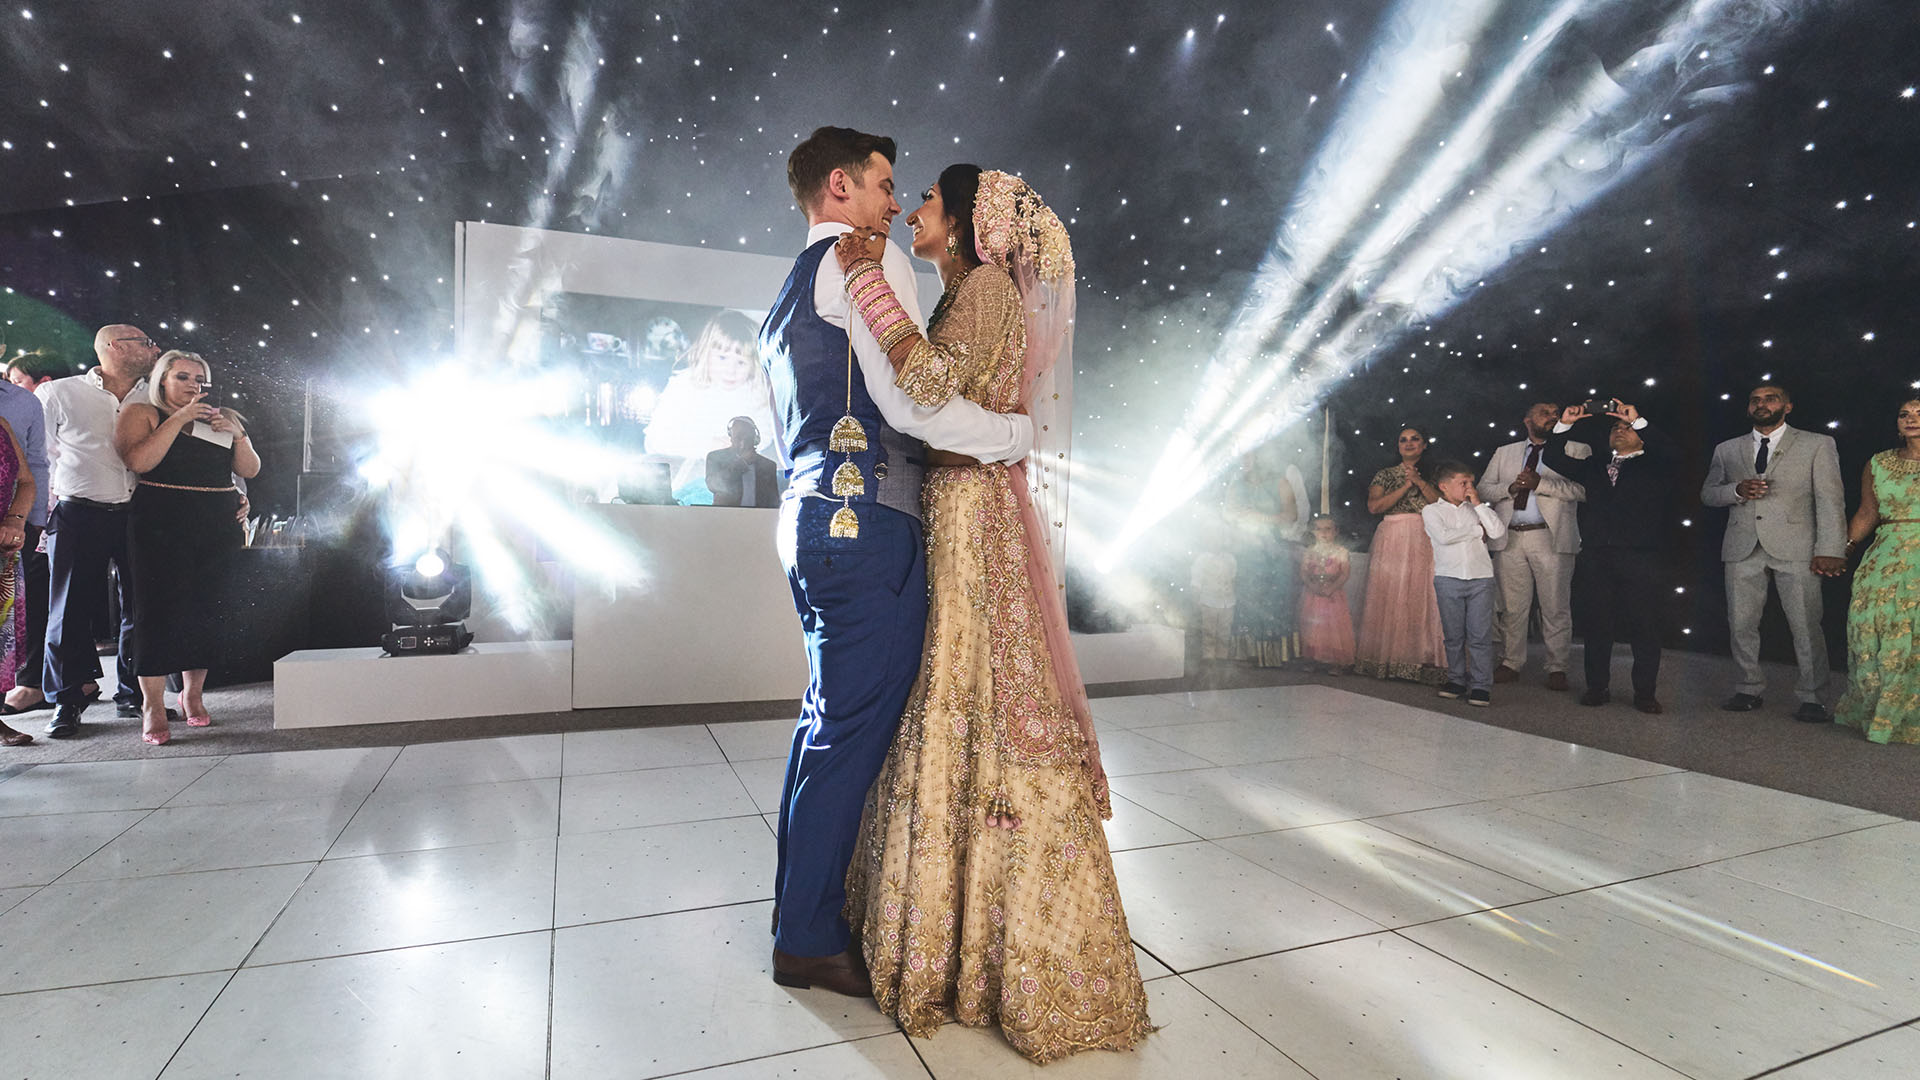 Summer Wedding First Dance Magic Bride & Groom - Wedding Photograher